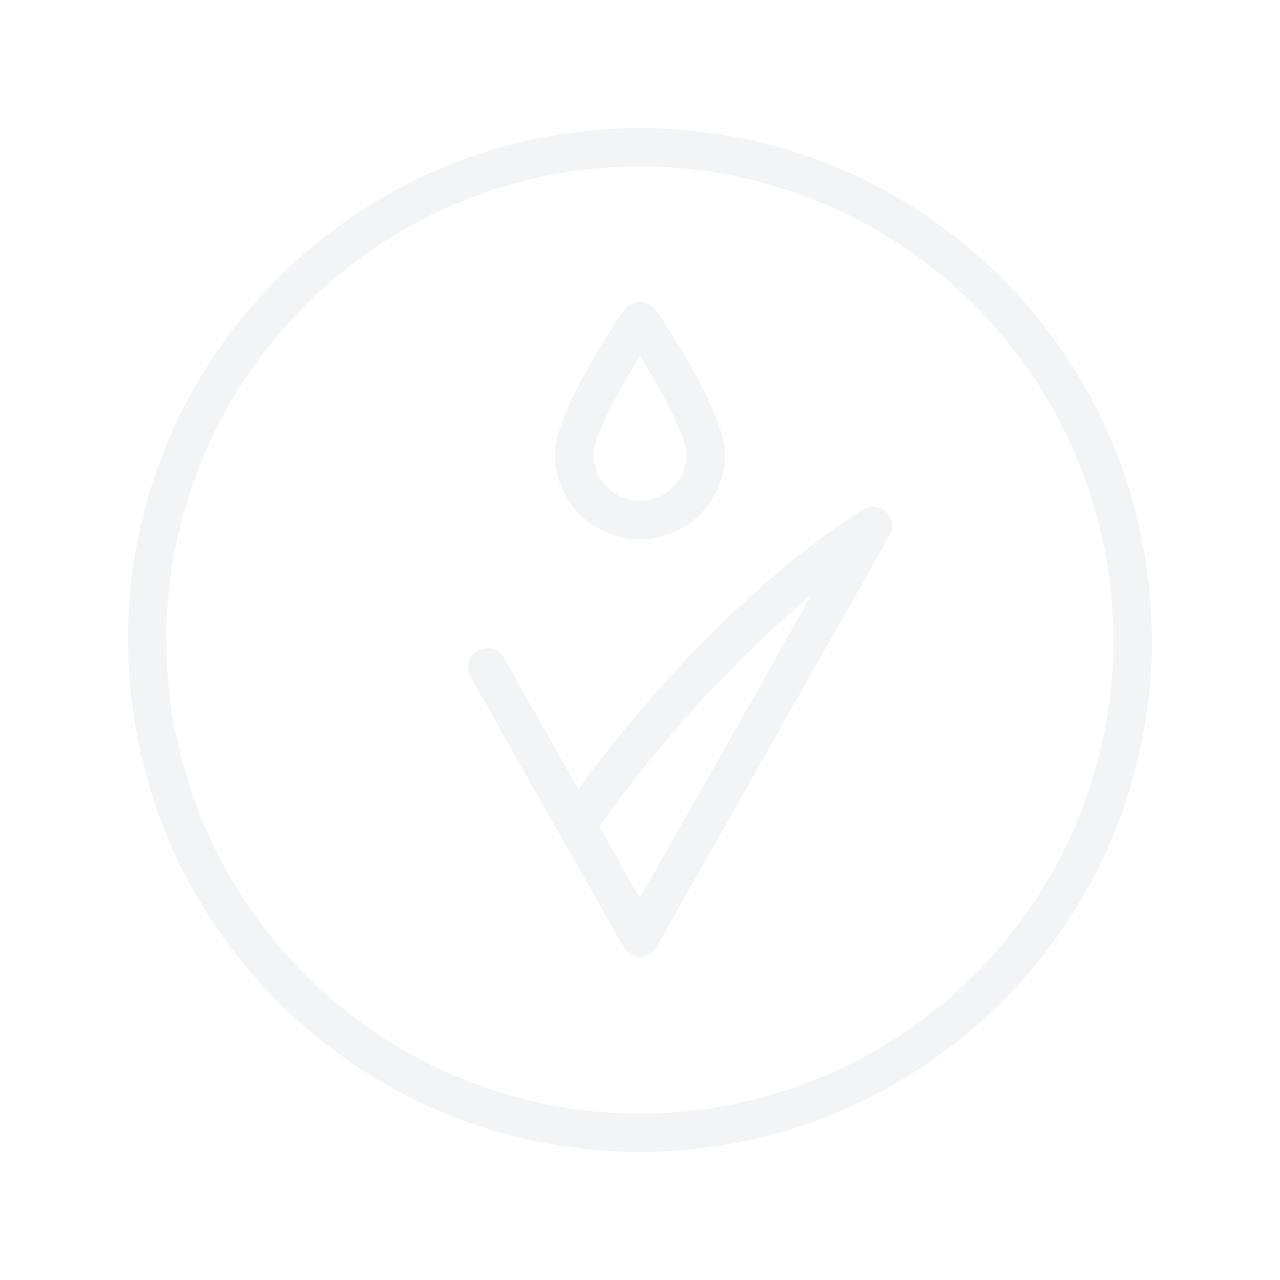 Secret Key Nature Recipe Aloe Sheet Mask 20g Skin Care Loverte Krezi Kamis 32 Maybelline Super Bb Cushion Fresh Matte 03 Natural